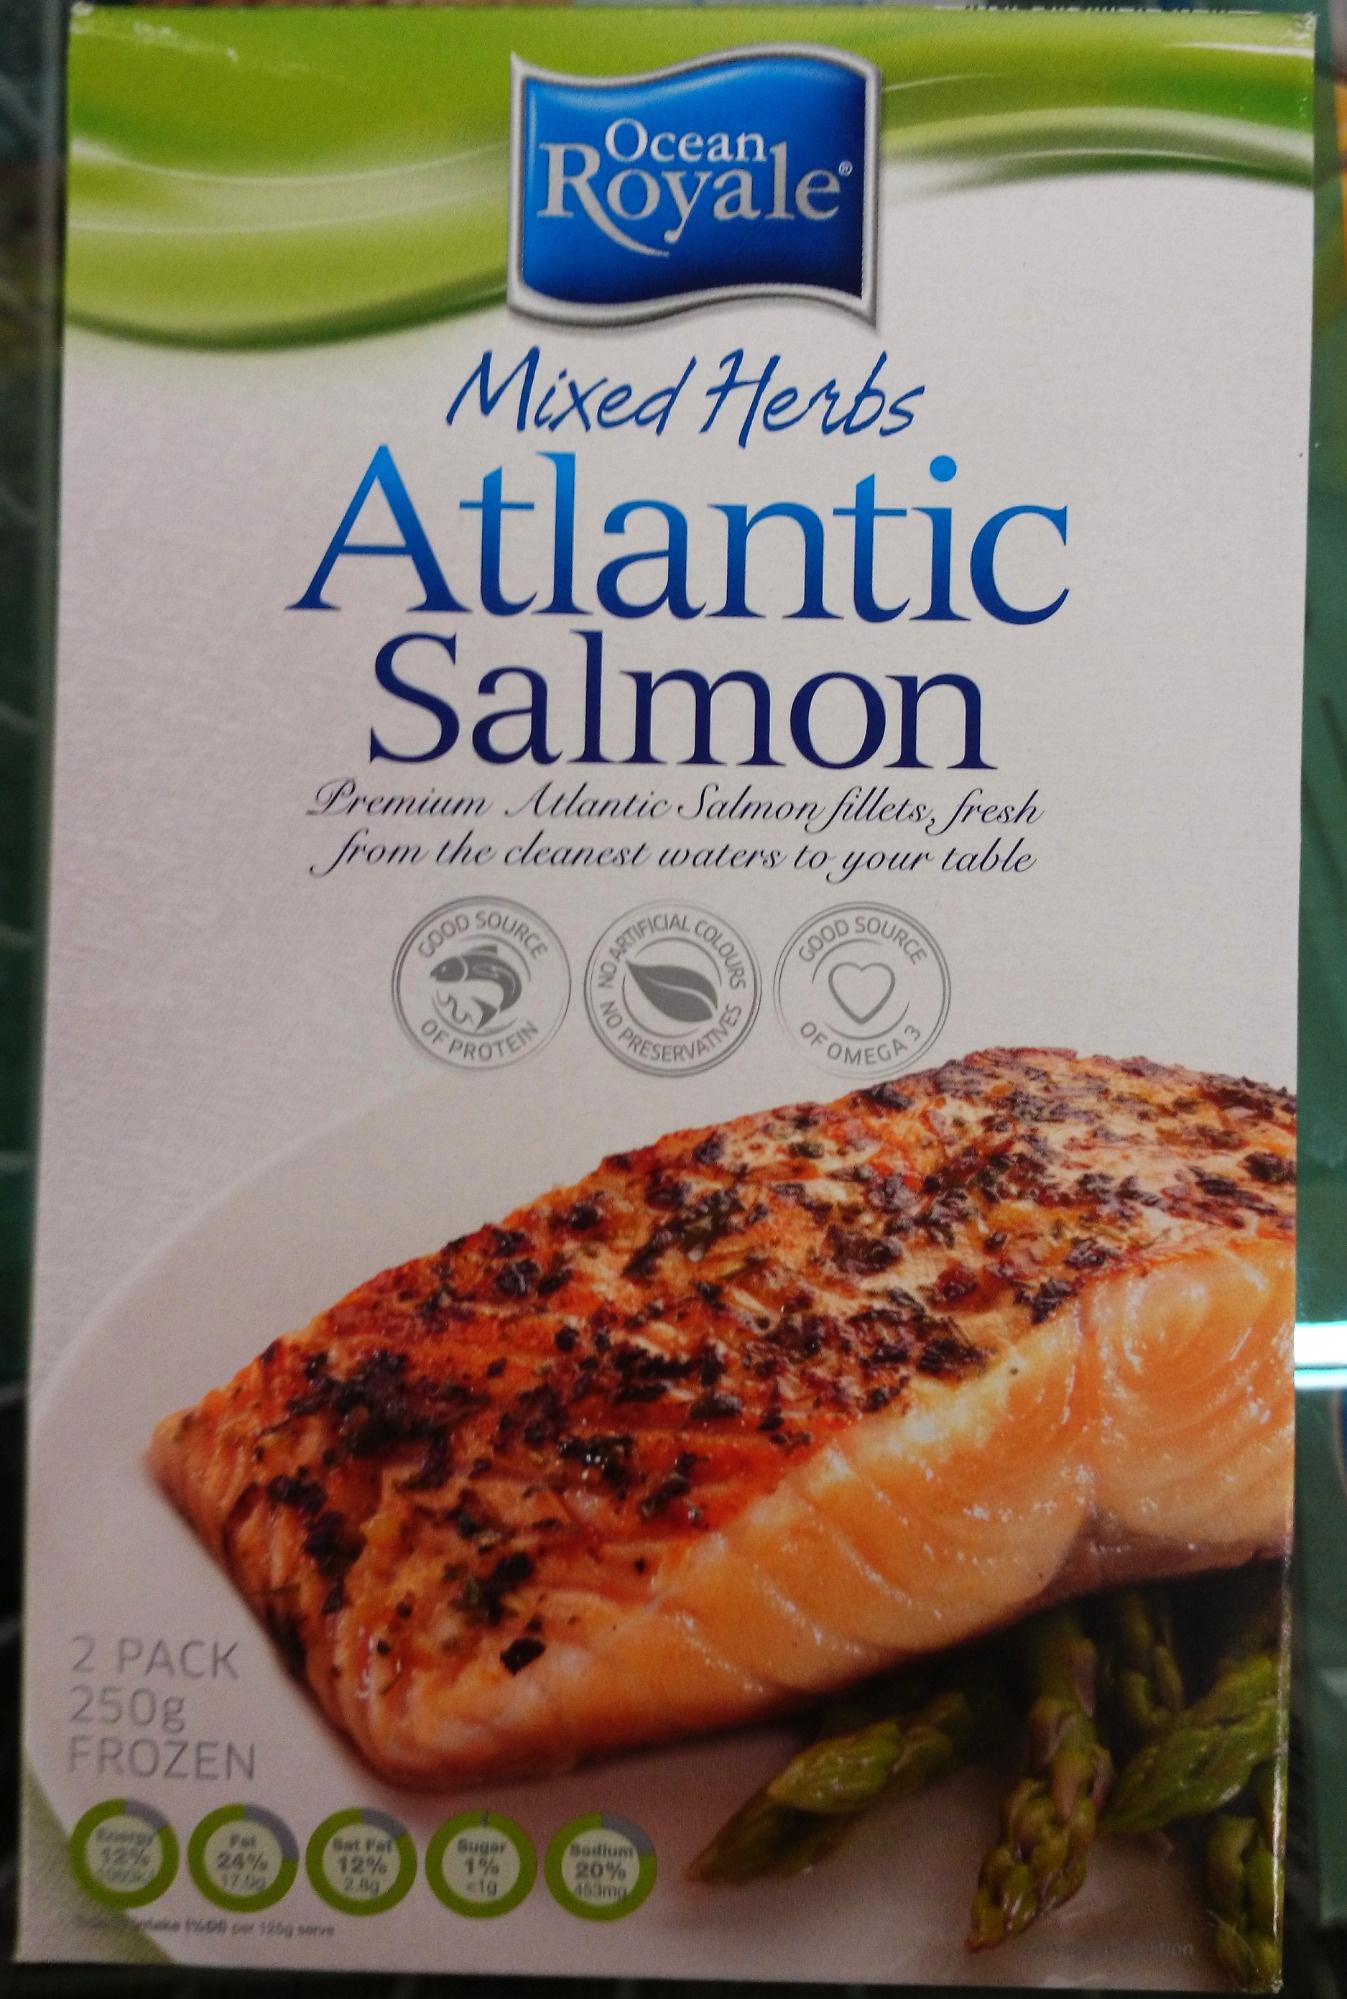 Mixed Herbs Atlantic Salmon - Product - en